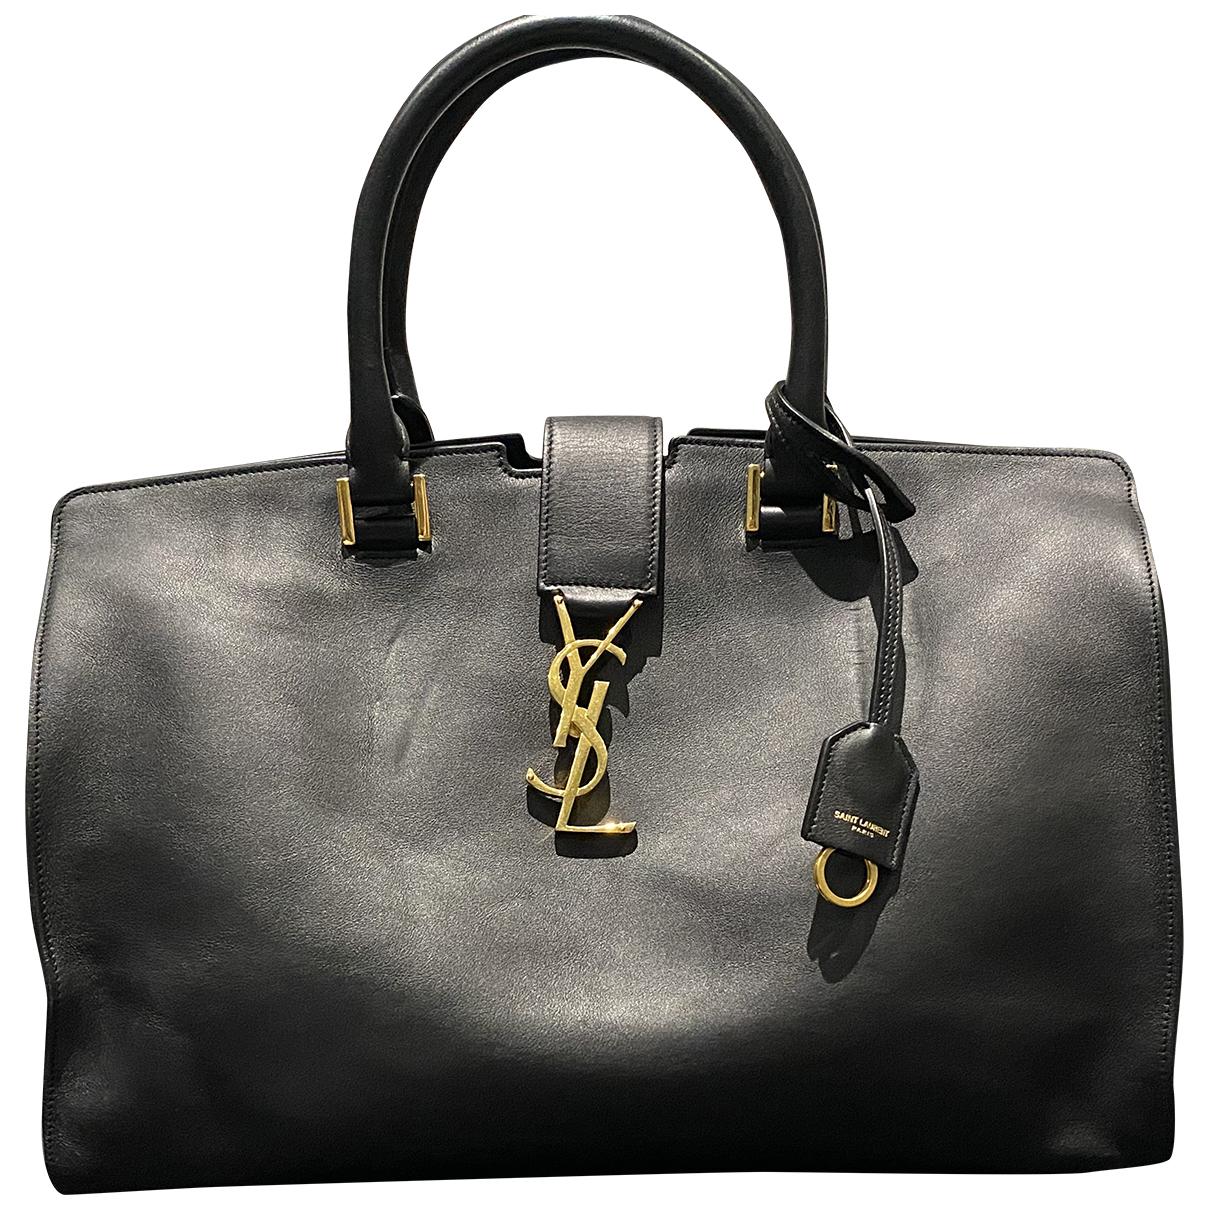 Saint Laurent Monogram Cabas Handtasche in  Schwarz Leder